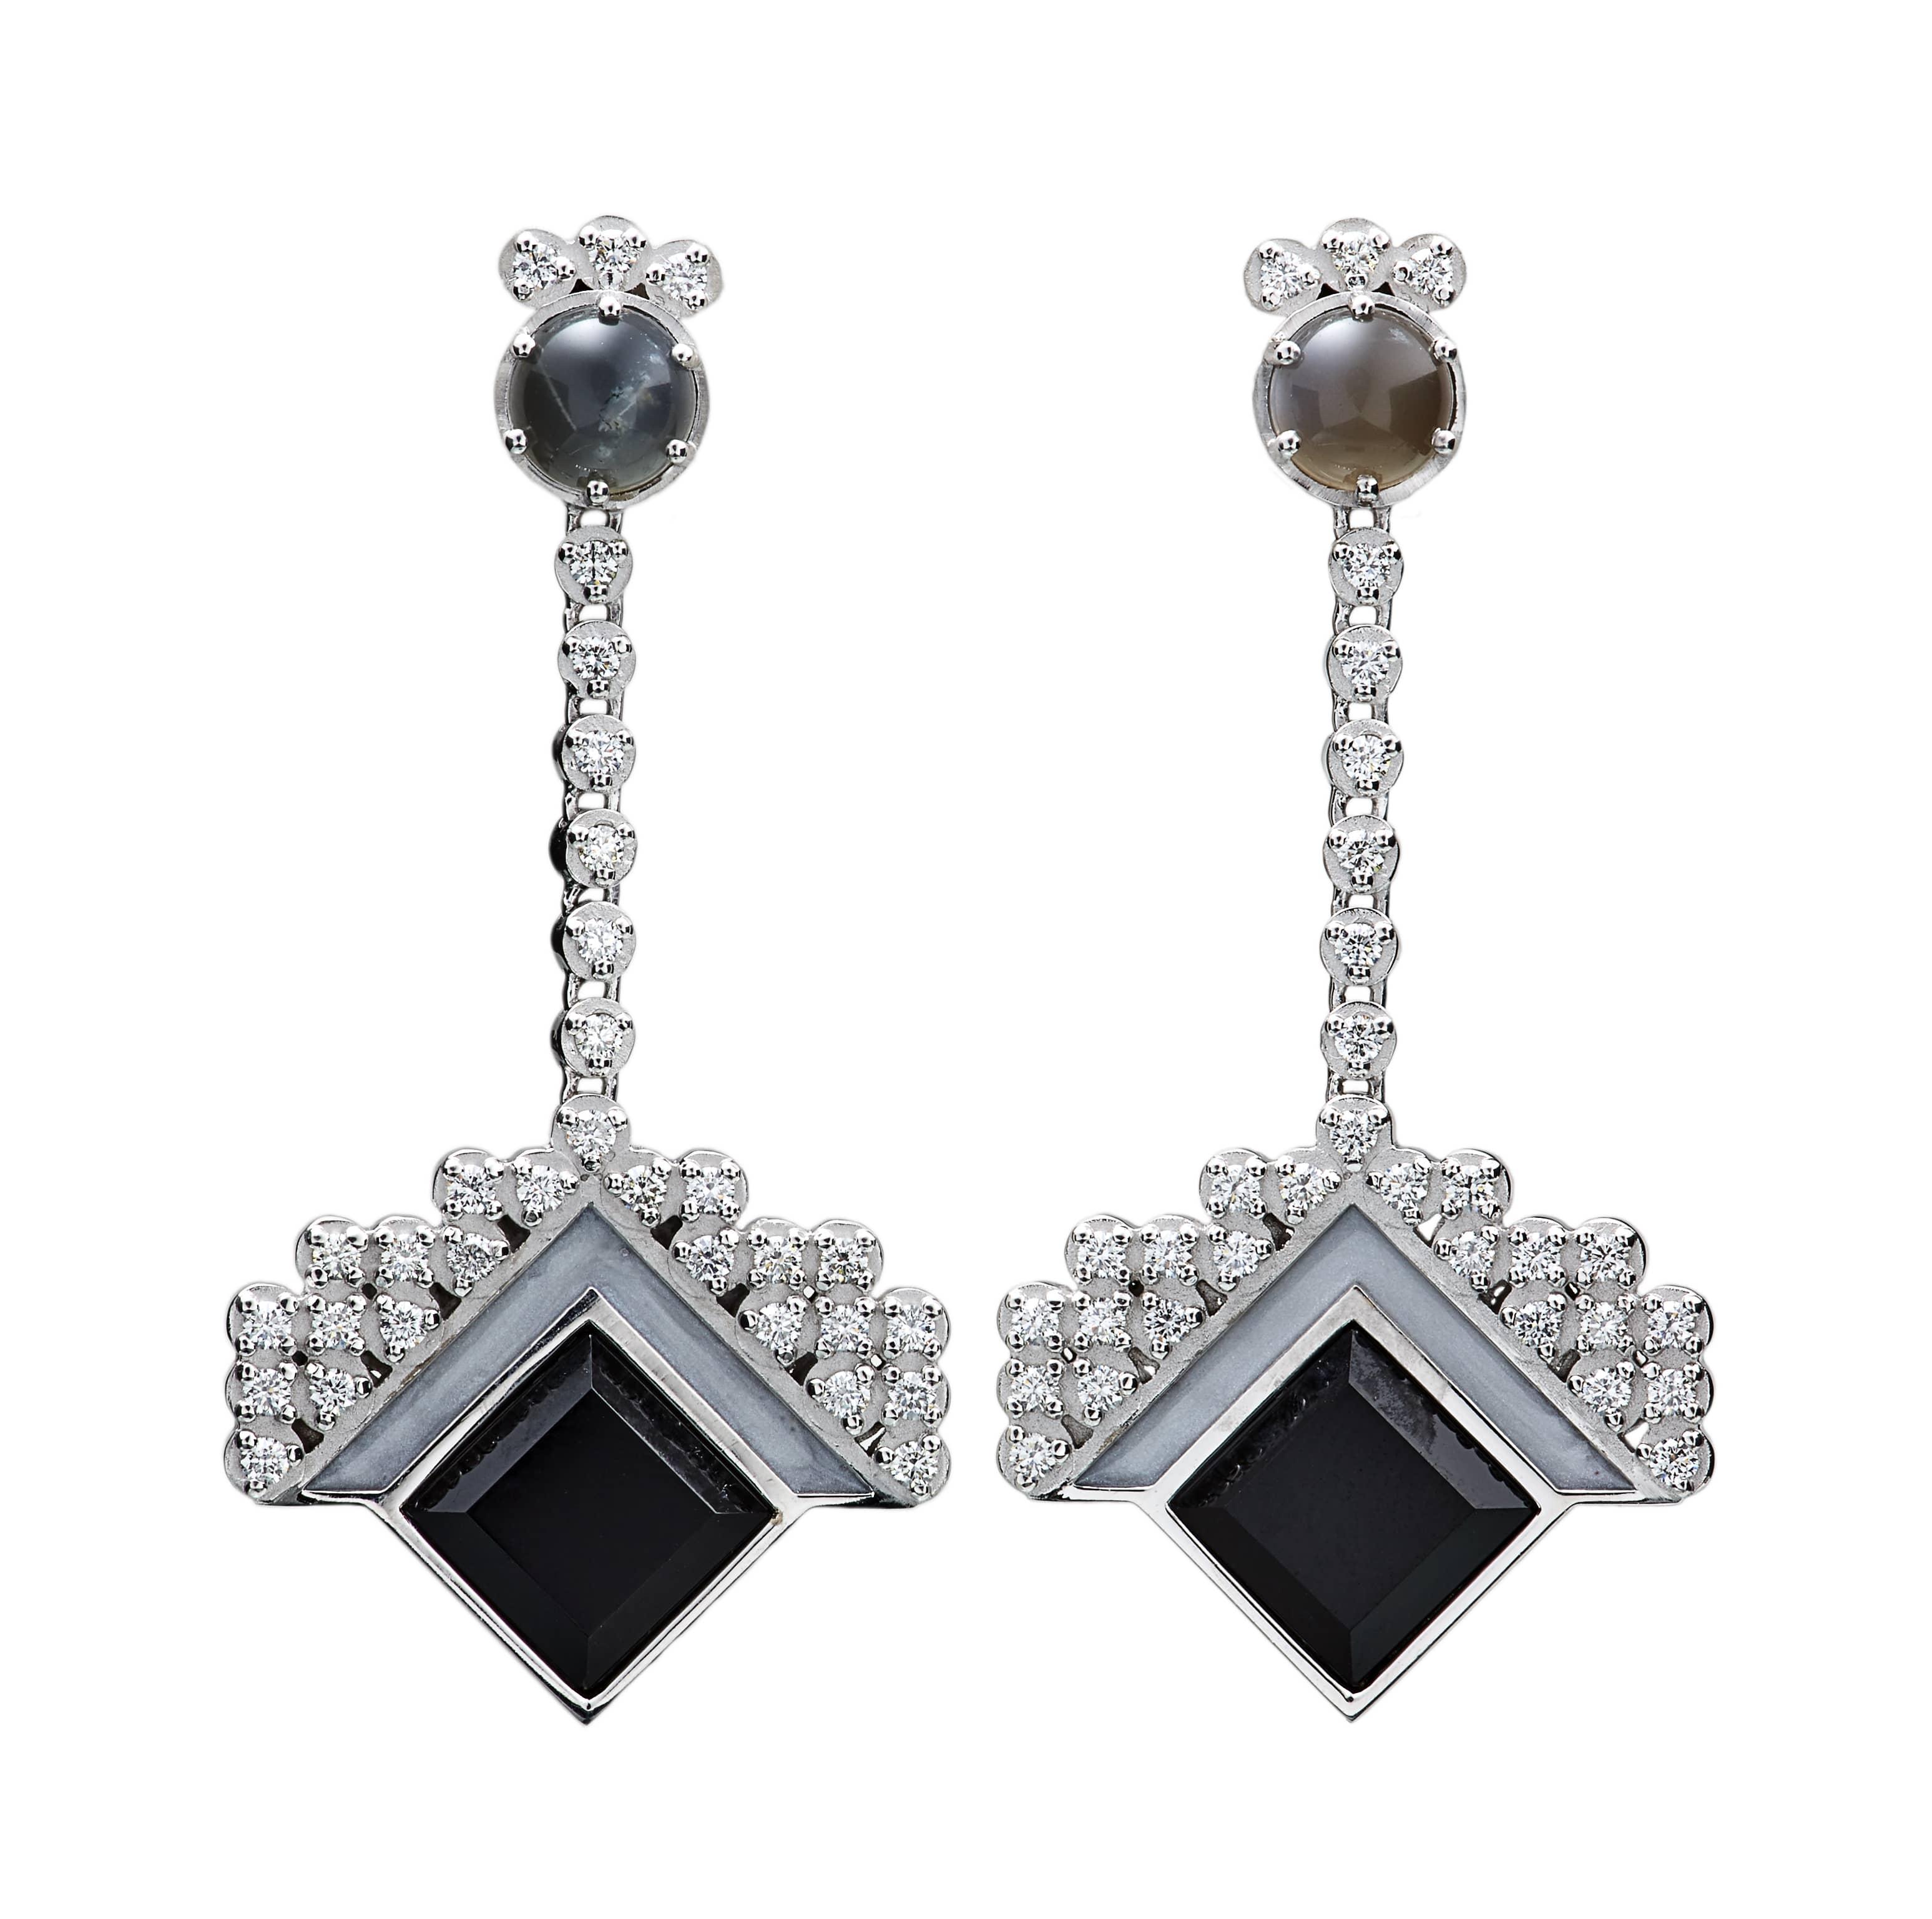 Artistar Anita Sondore_Earrings_Diamond Moonlight Earrings